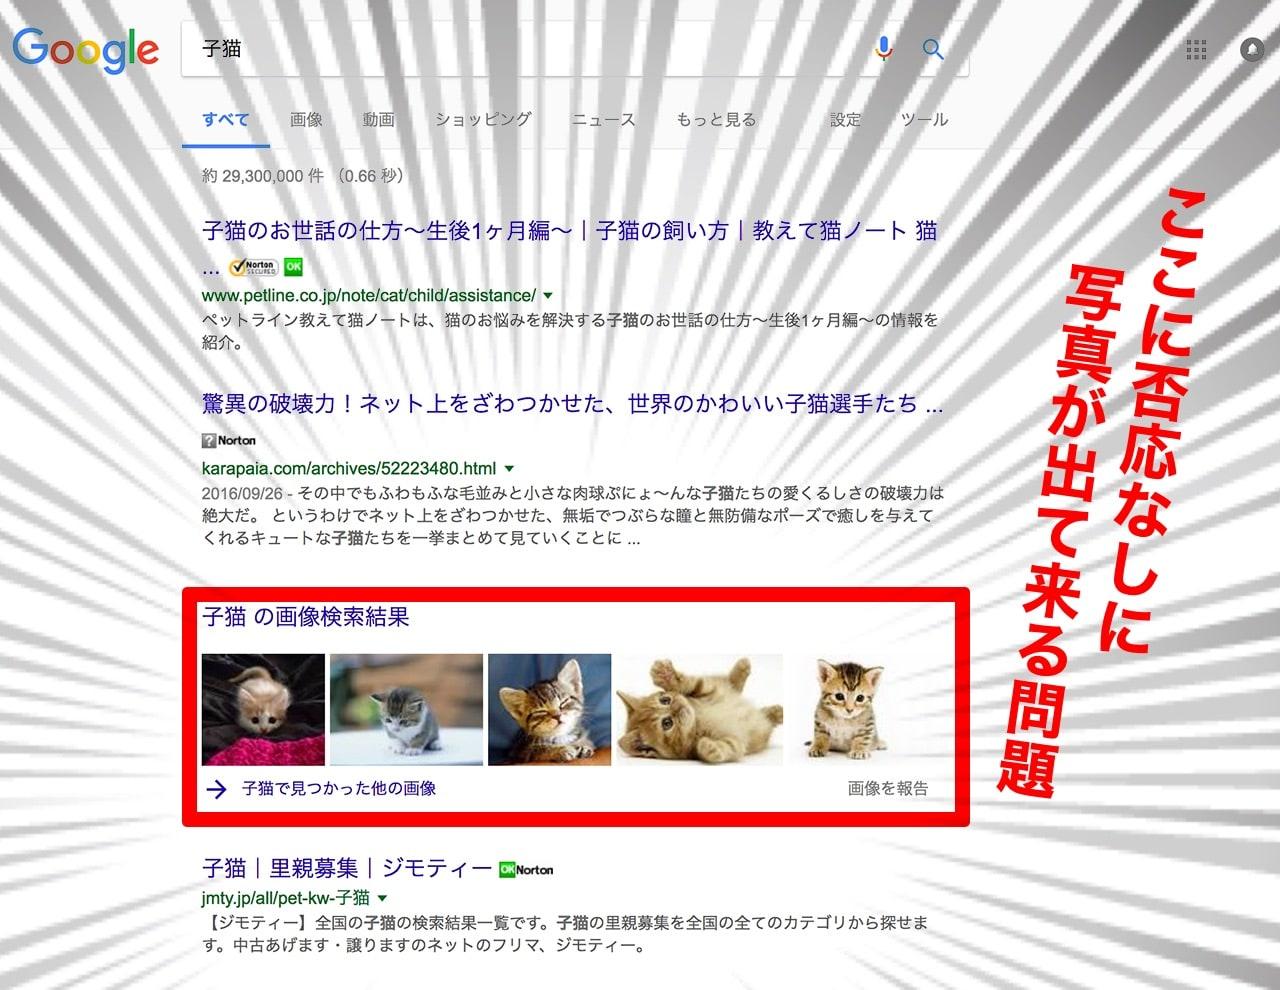 Googleの関連画像が自動で表示される件(深刻)